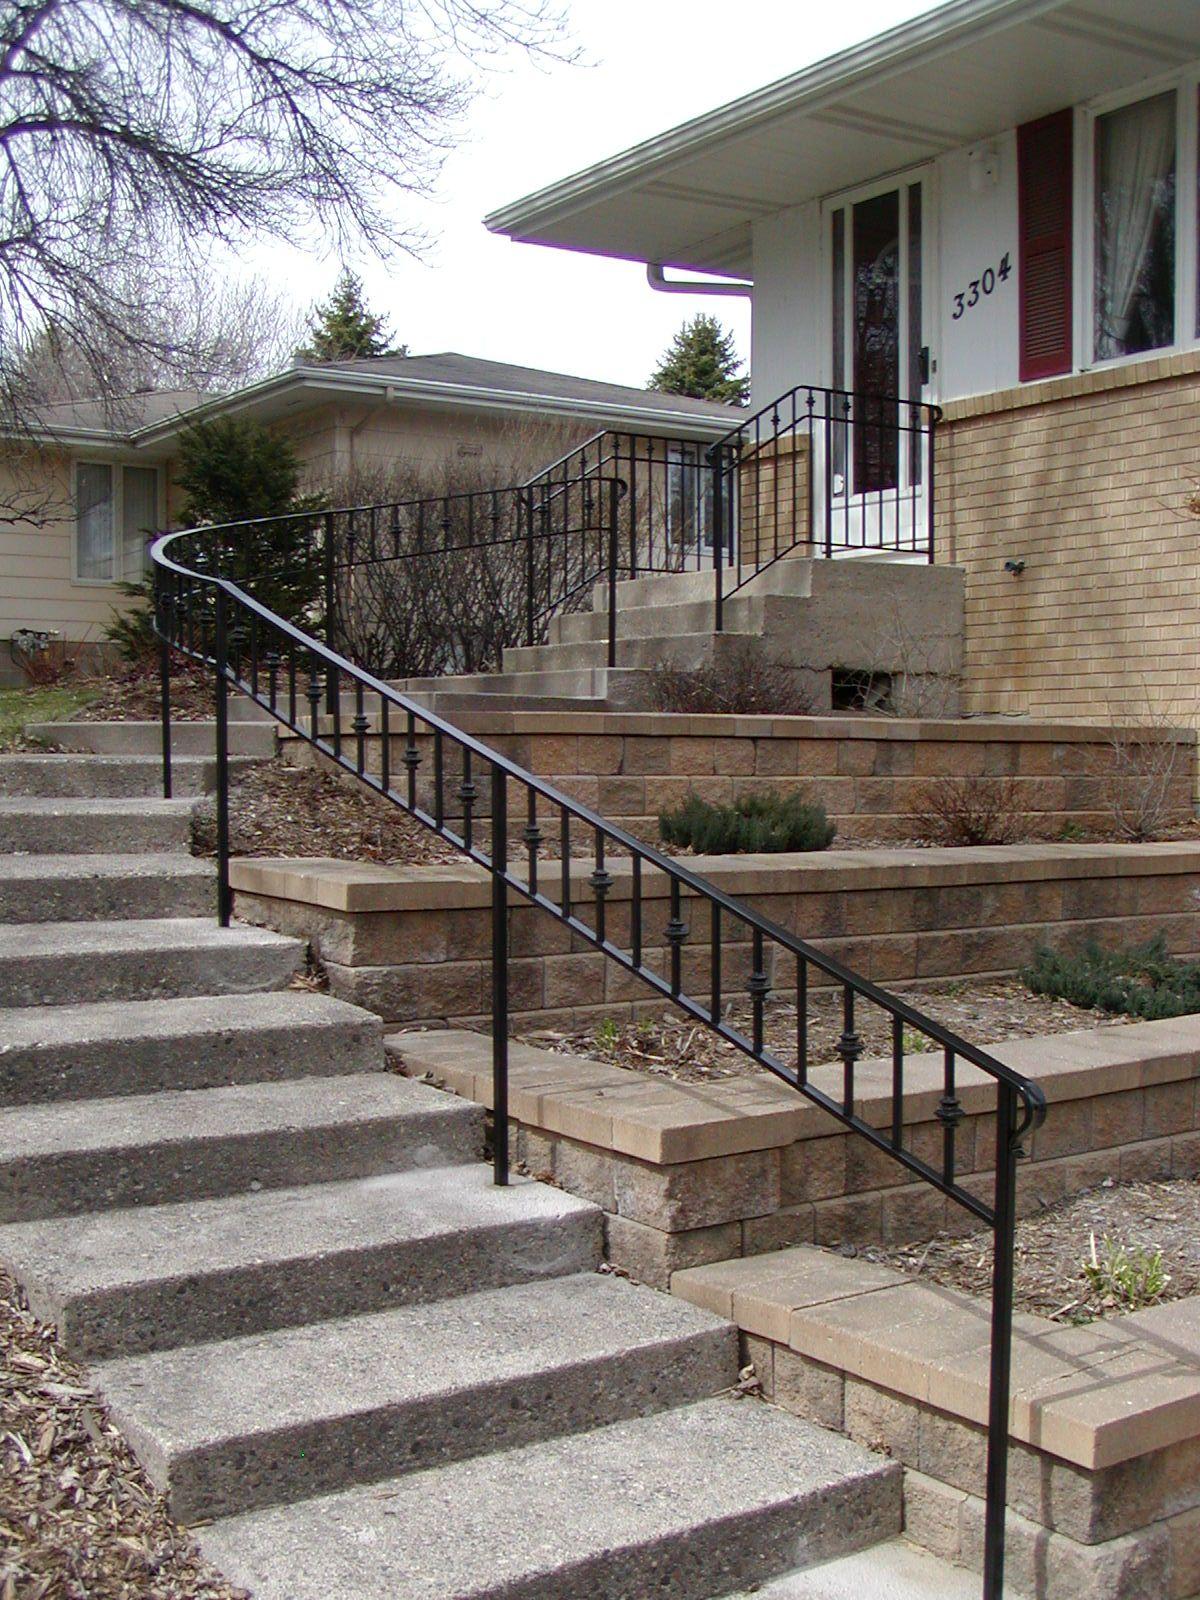 Curved Iron Step Railing Railings Outdoor Iron Railings   Aluminum Railing For Outside Steps